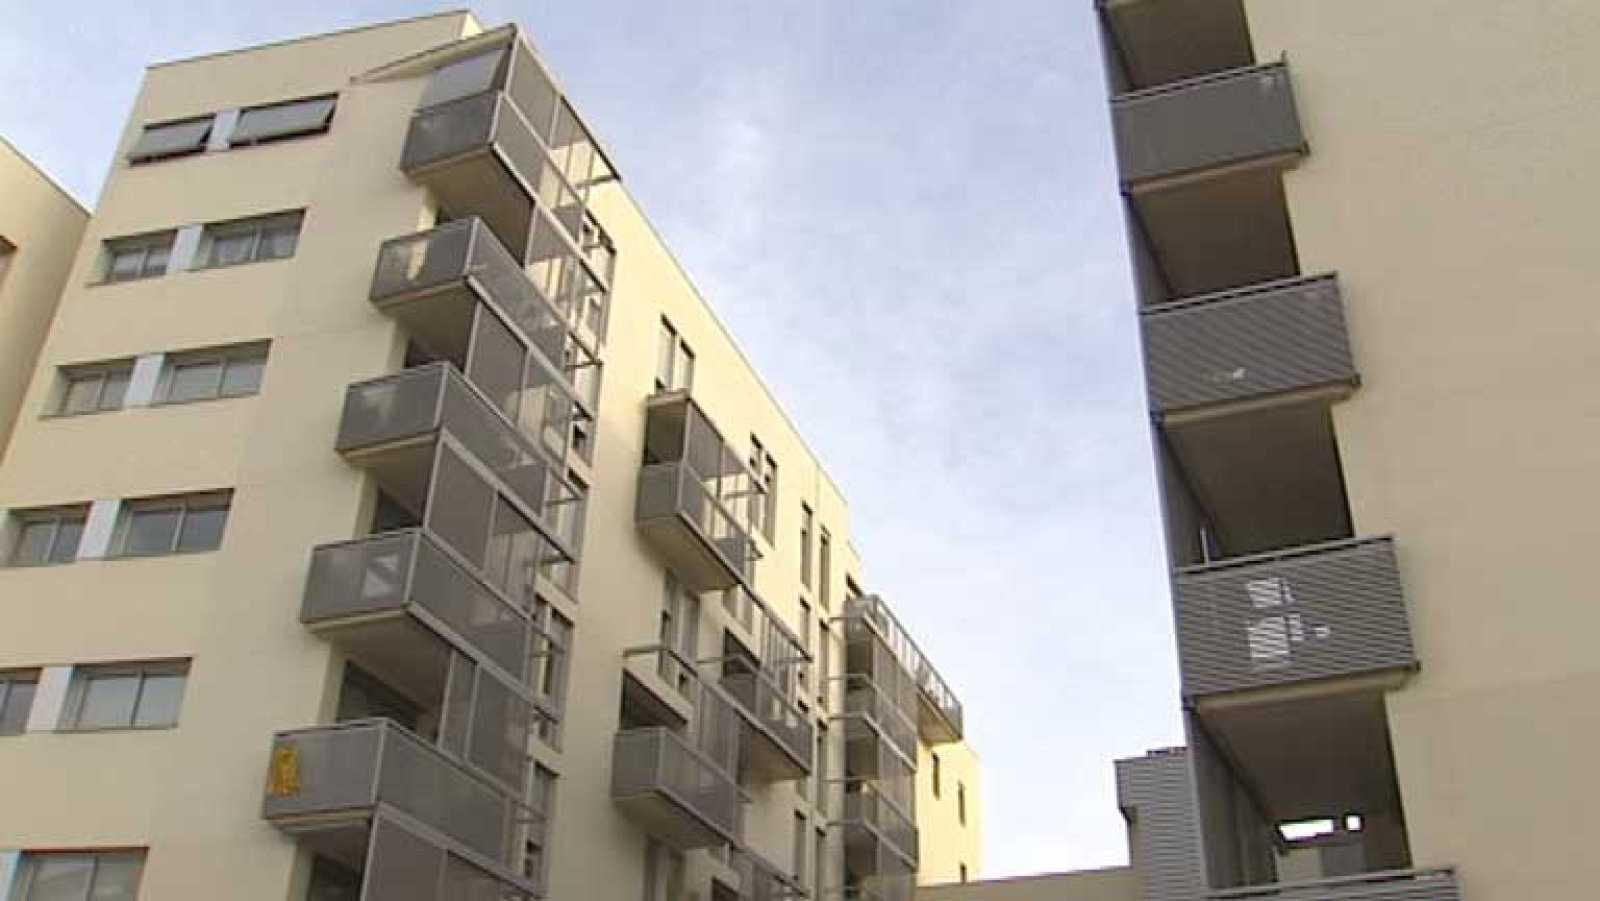 Atrapados por las 'hipotecas burbuja'